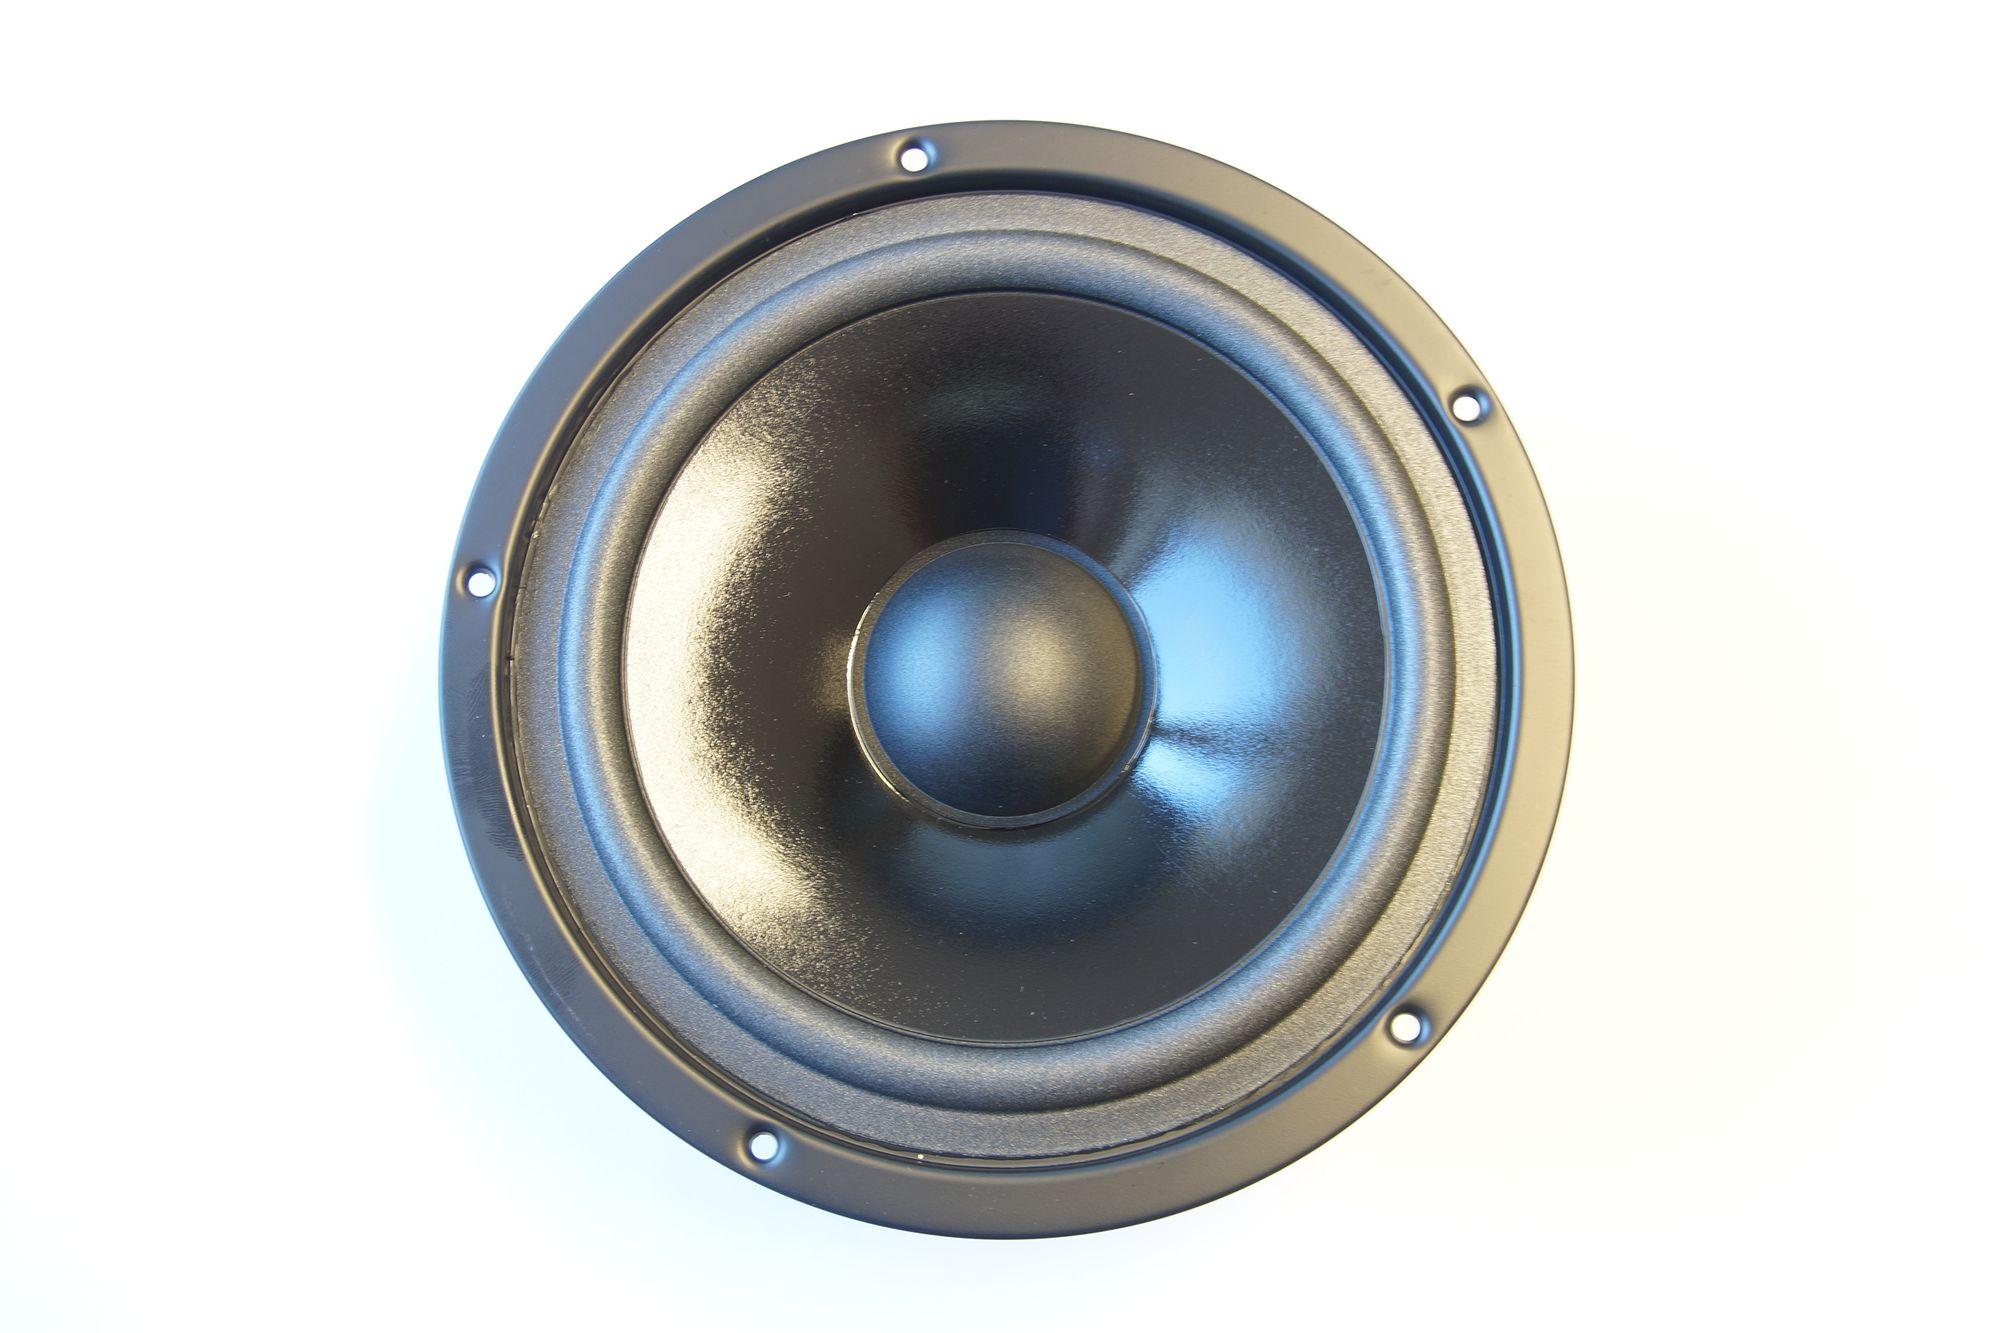 1 Stück Magnat Precision Components Basslautsprecher Tieftöner W 200 CP 470 Neuware